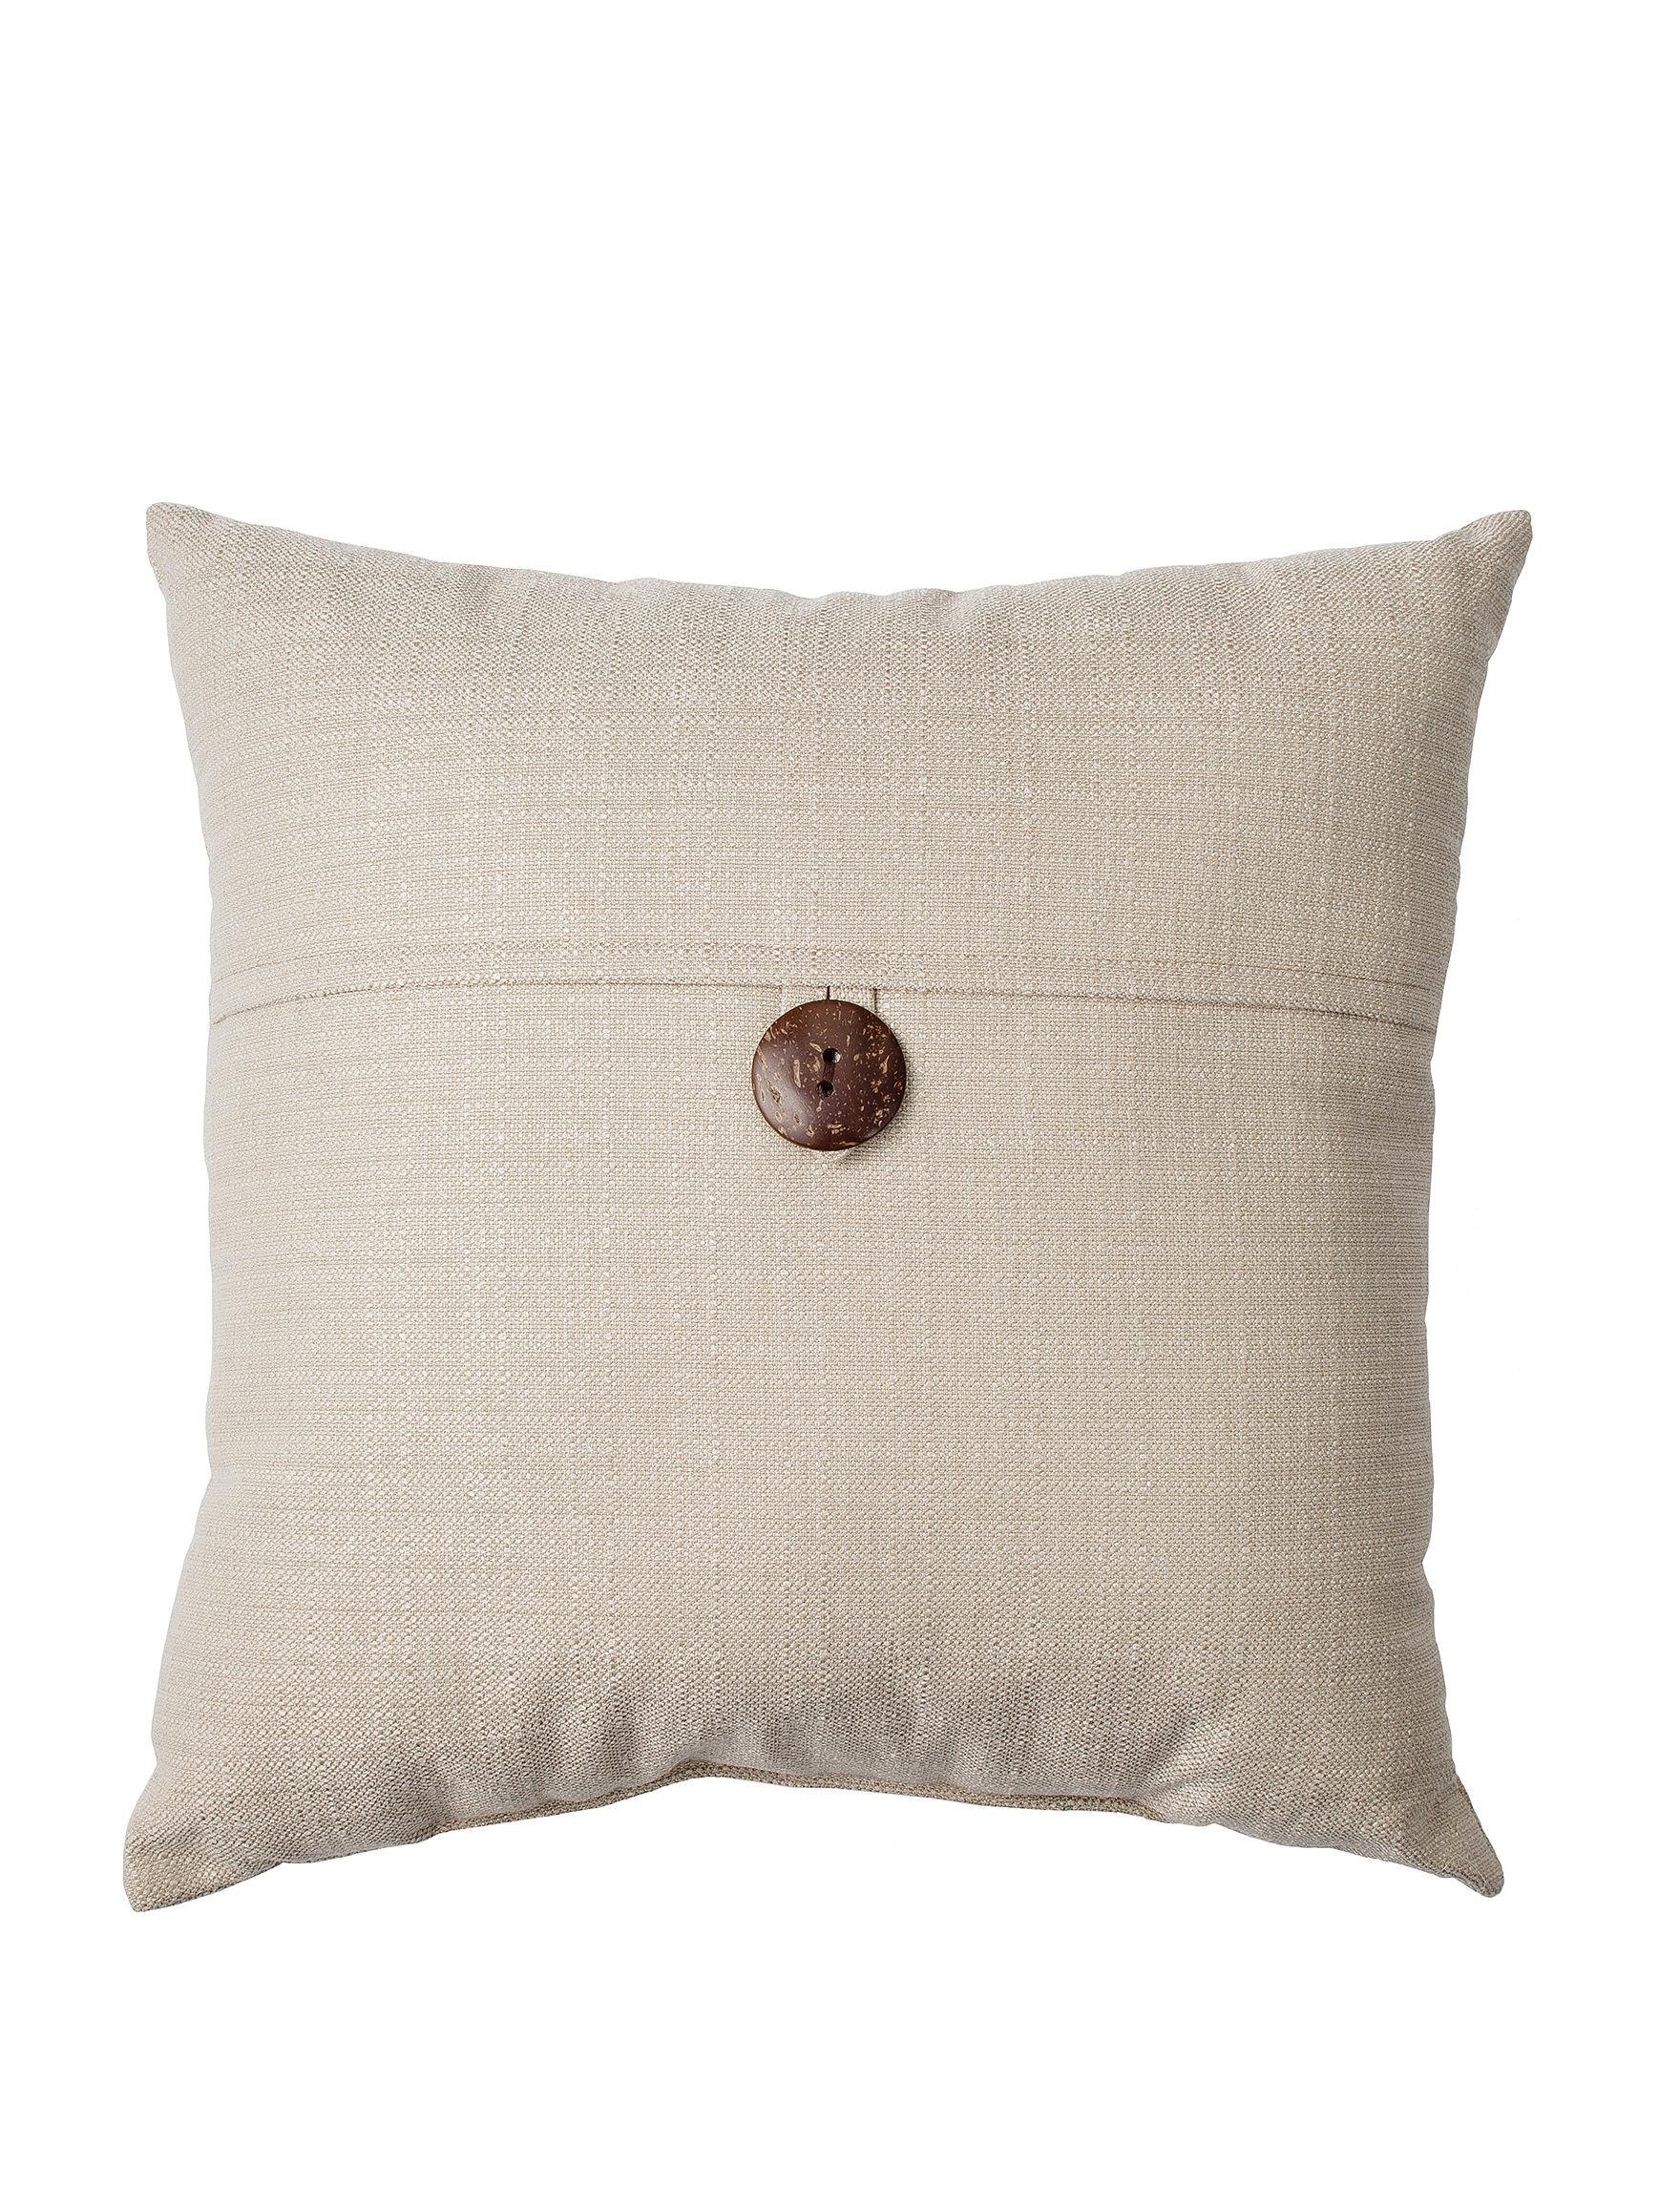 Home Fashions International Linen Decorative Pillows